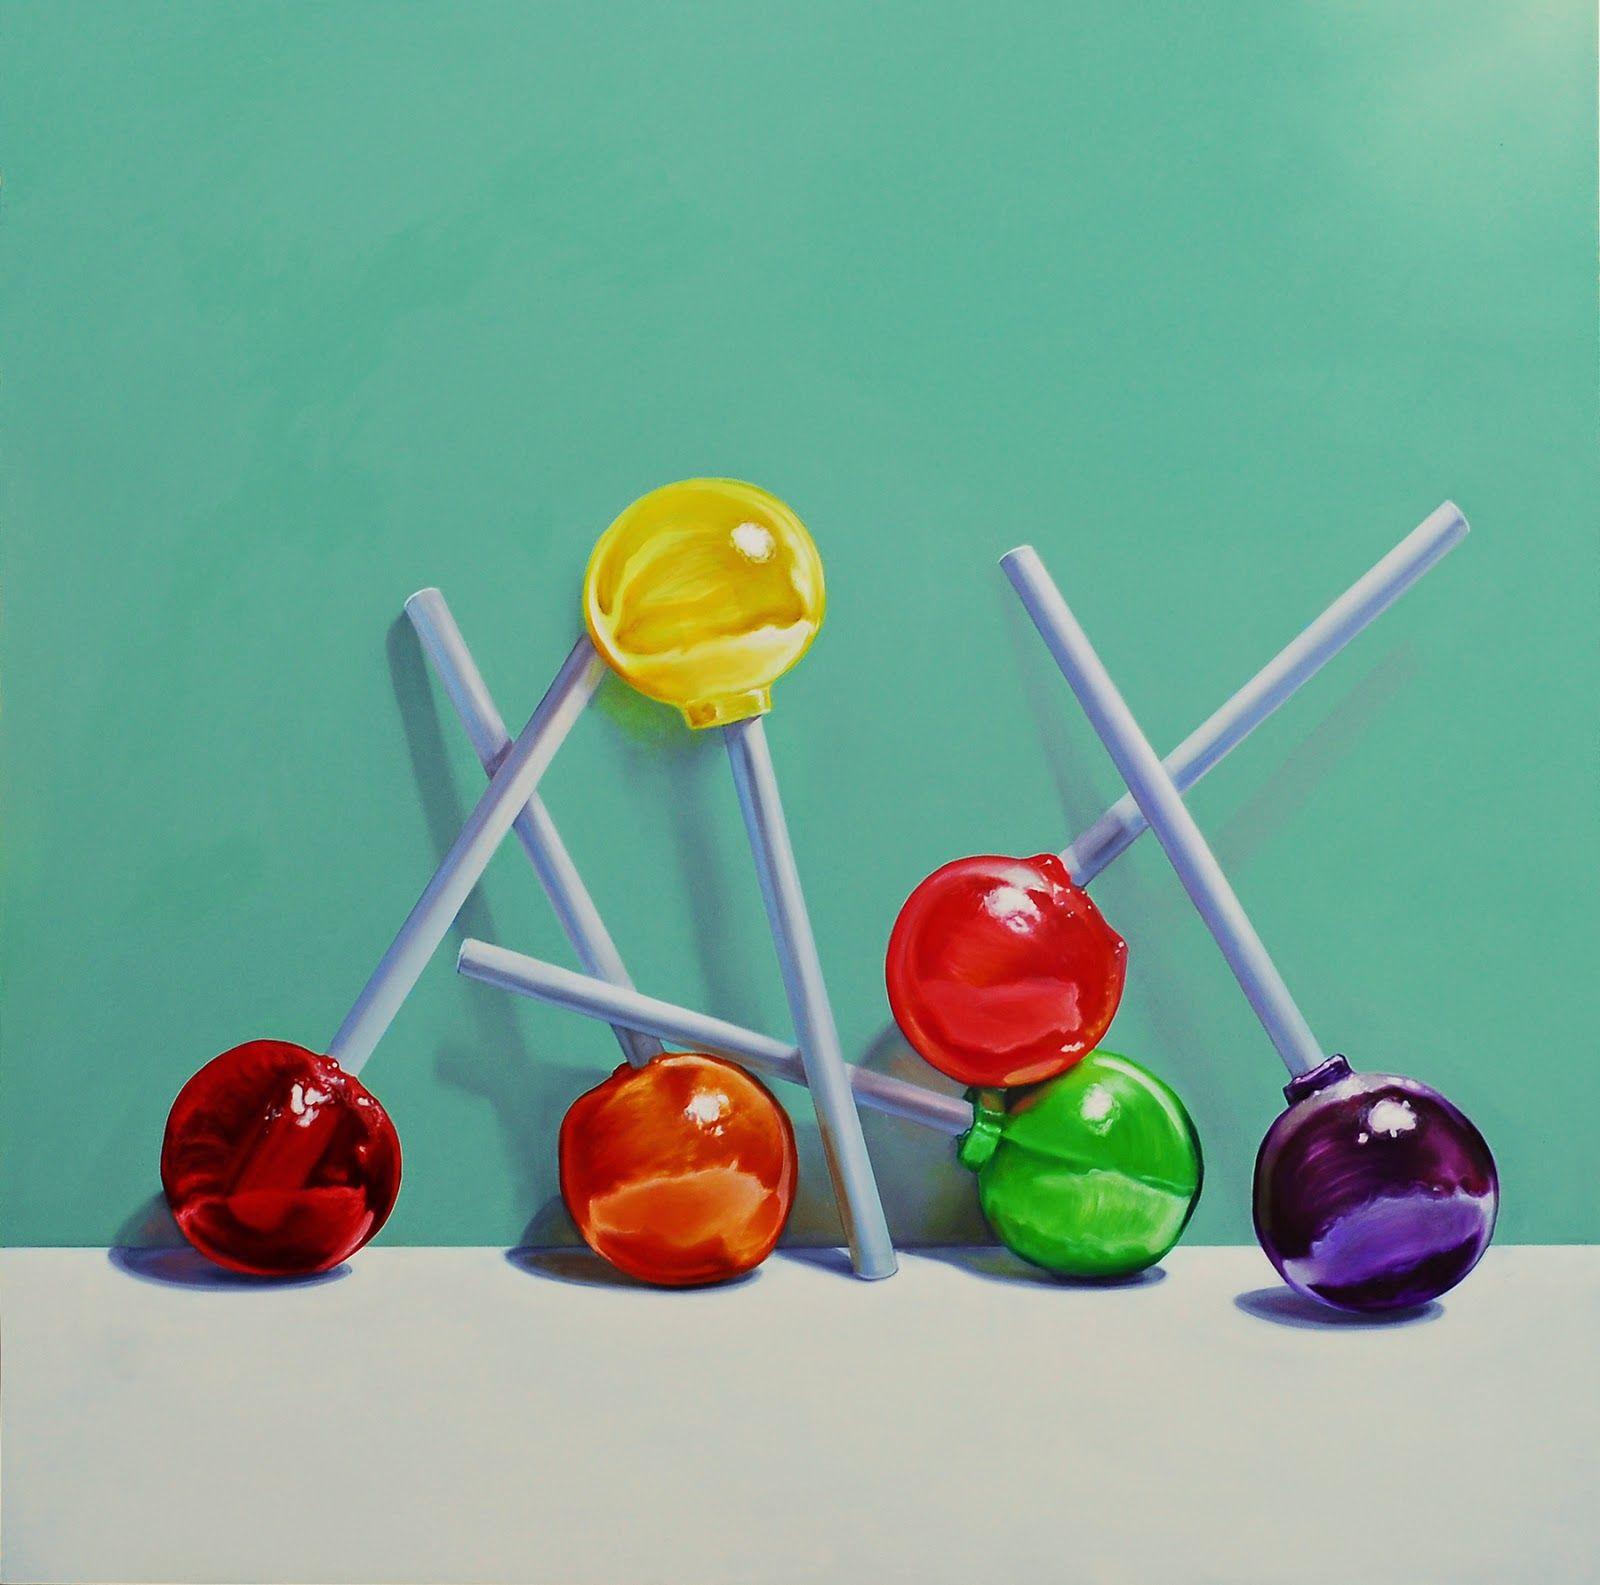 Lollipop painting, still life, original candy painting jeanne vadeboncoeur